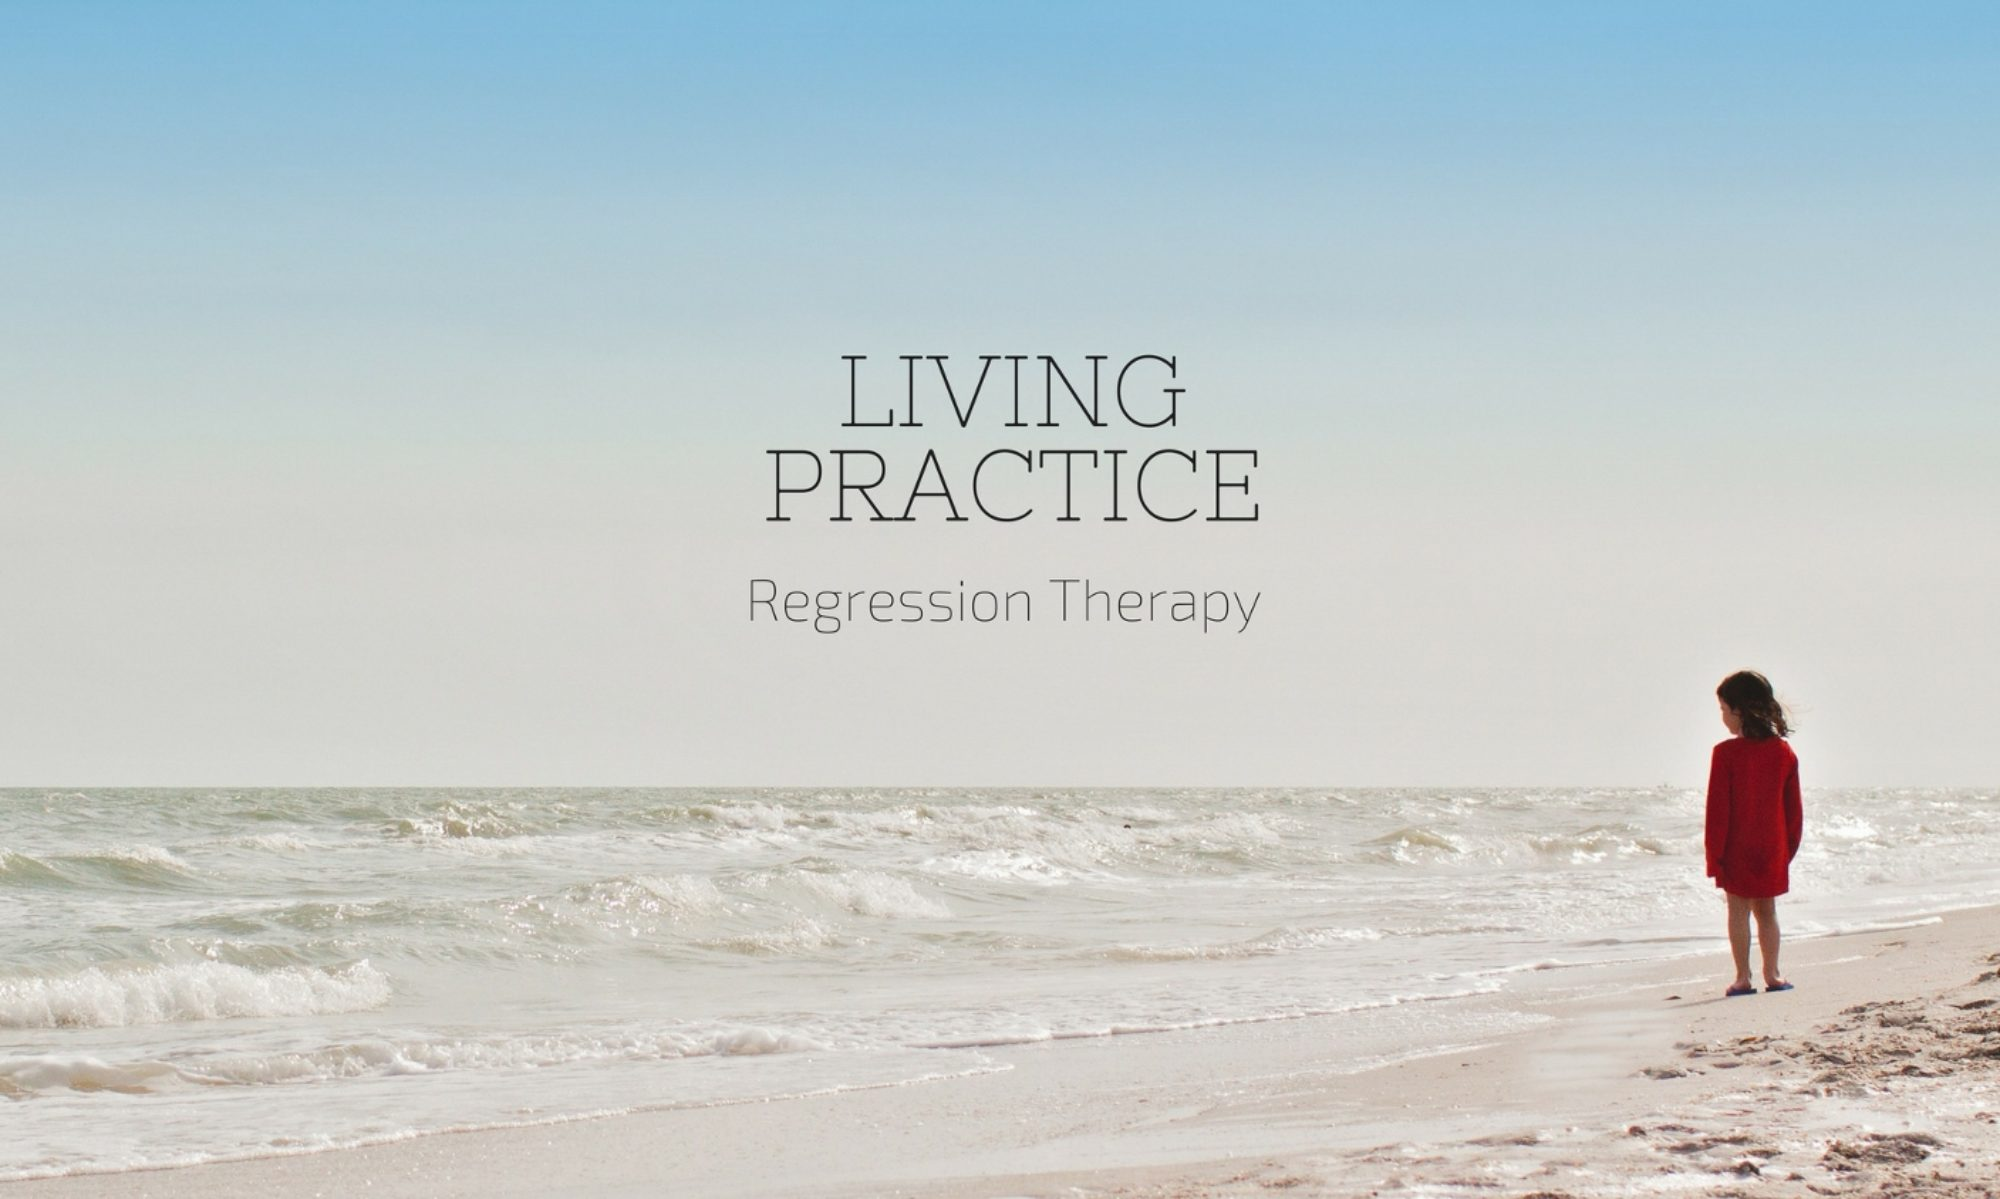 LIVING PRACTICE